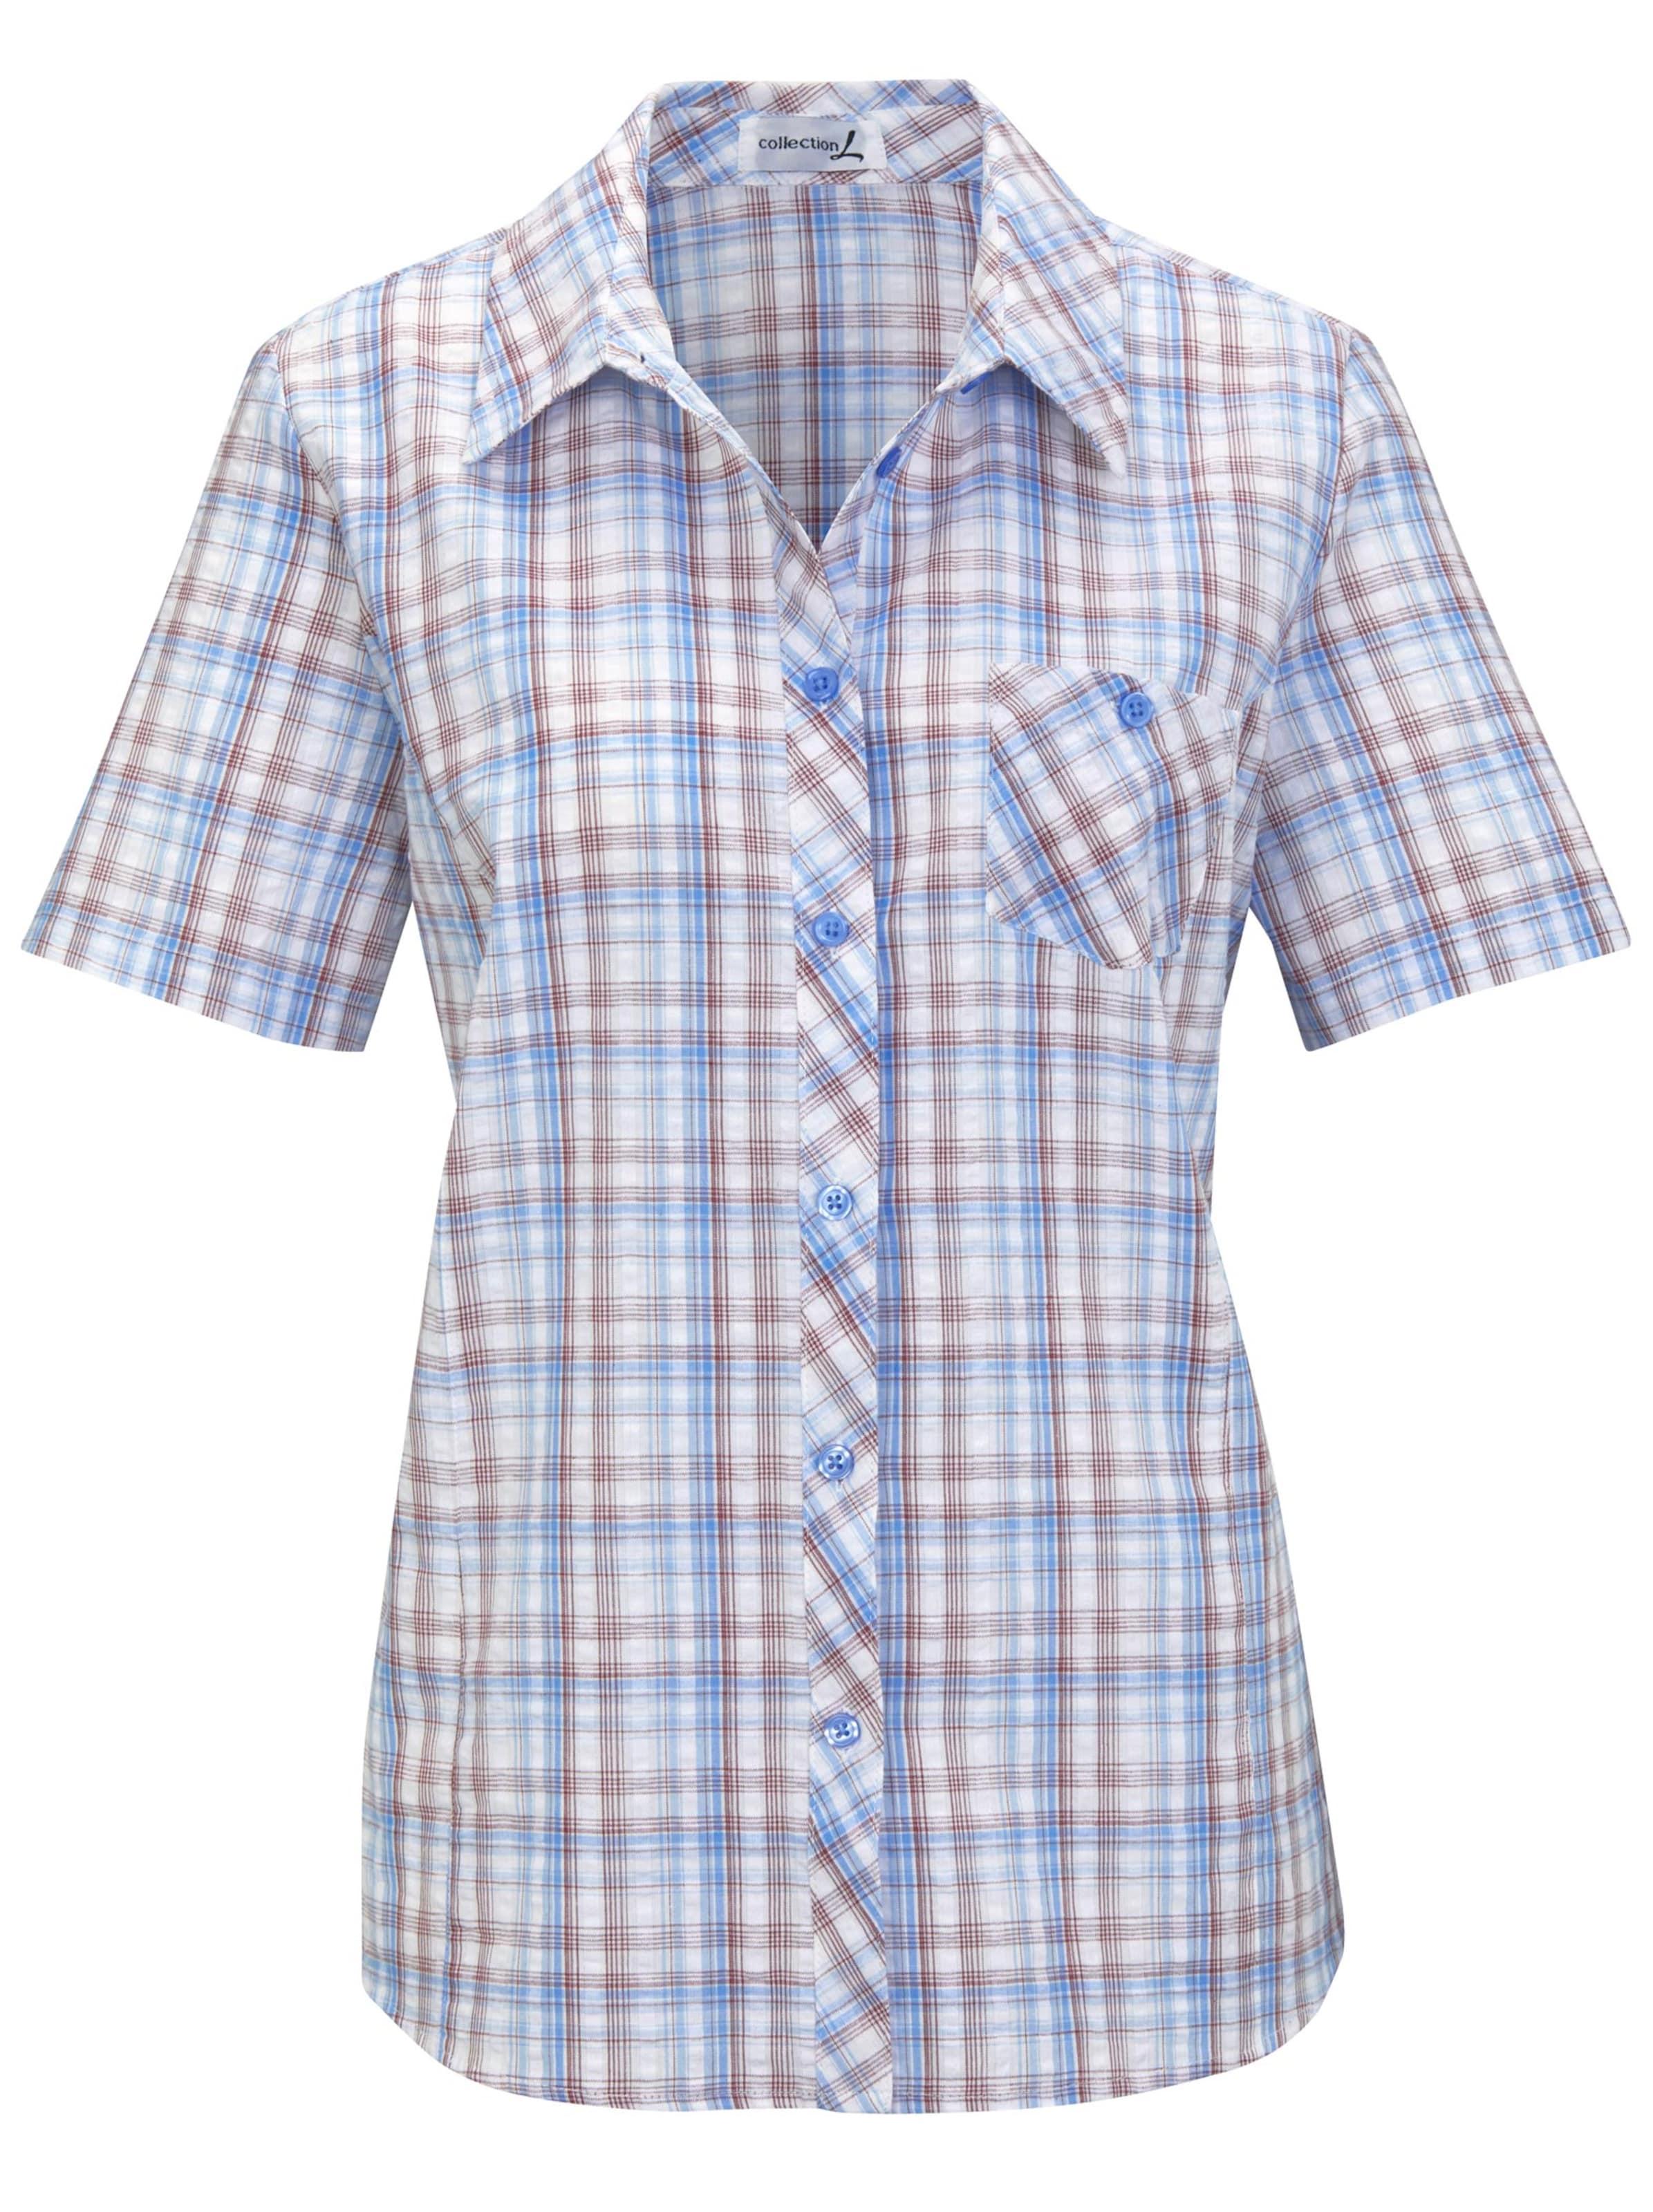 Your Look... for less! Dames Katoenen blouse jeansblauw geruit Größe